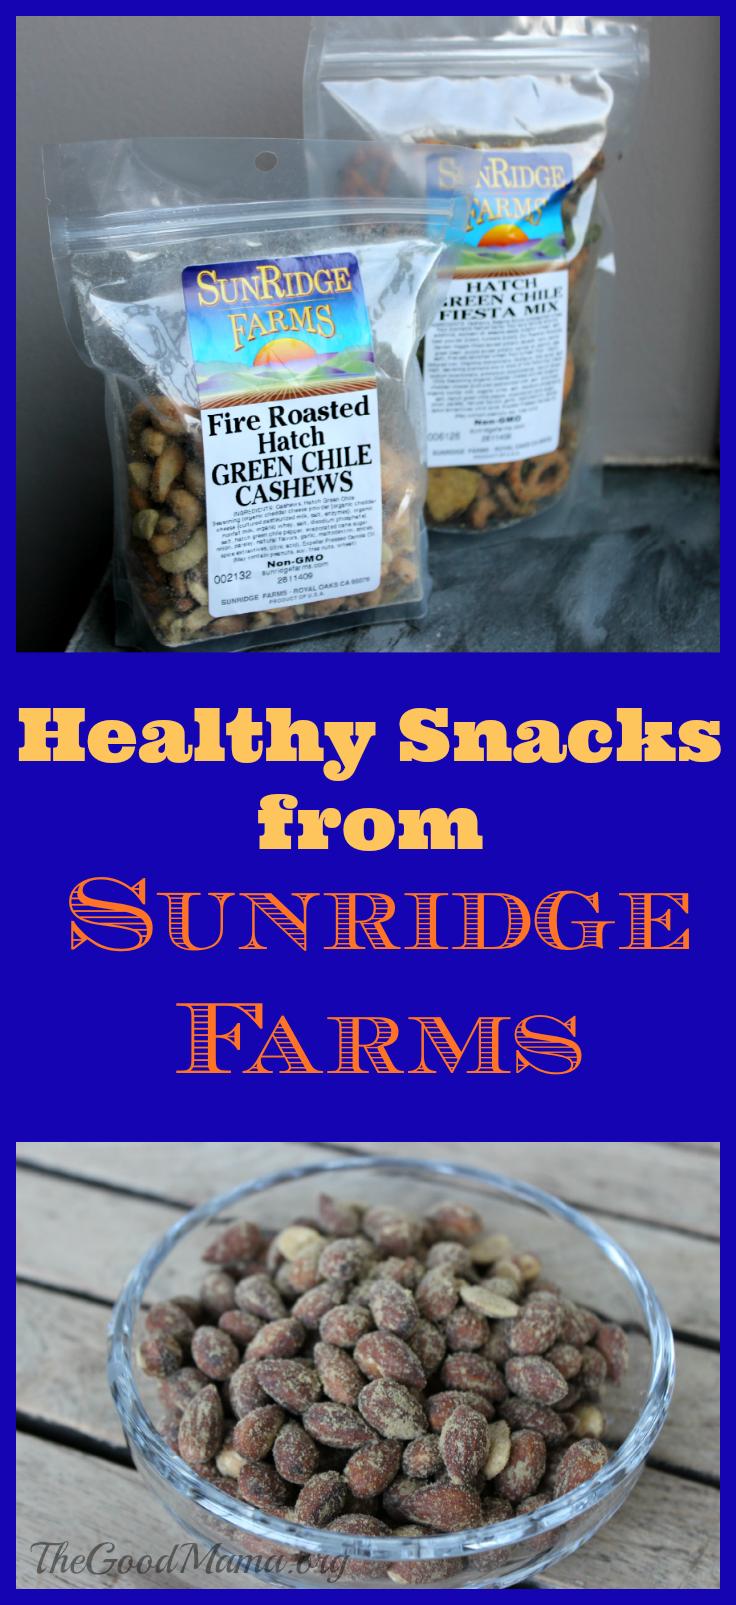 Healthy Snacks from SunRidge Farms- So tasty!